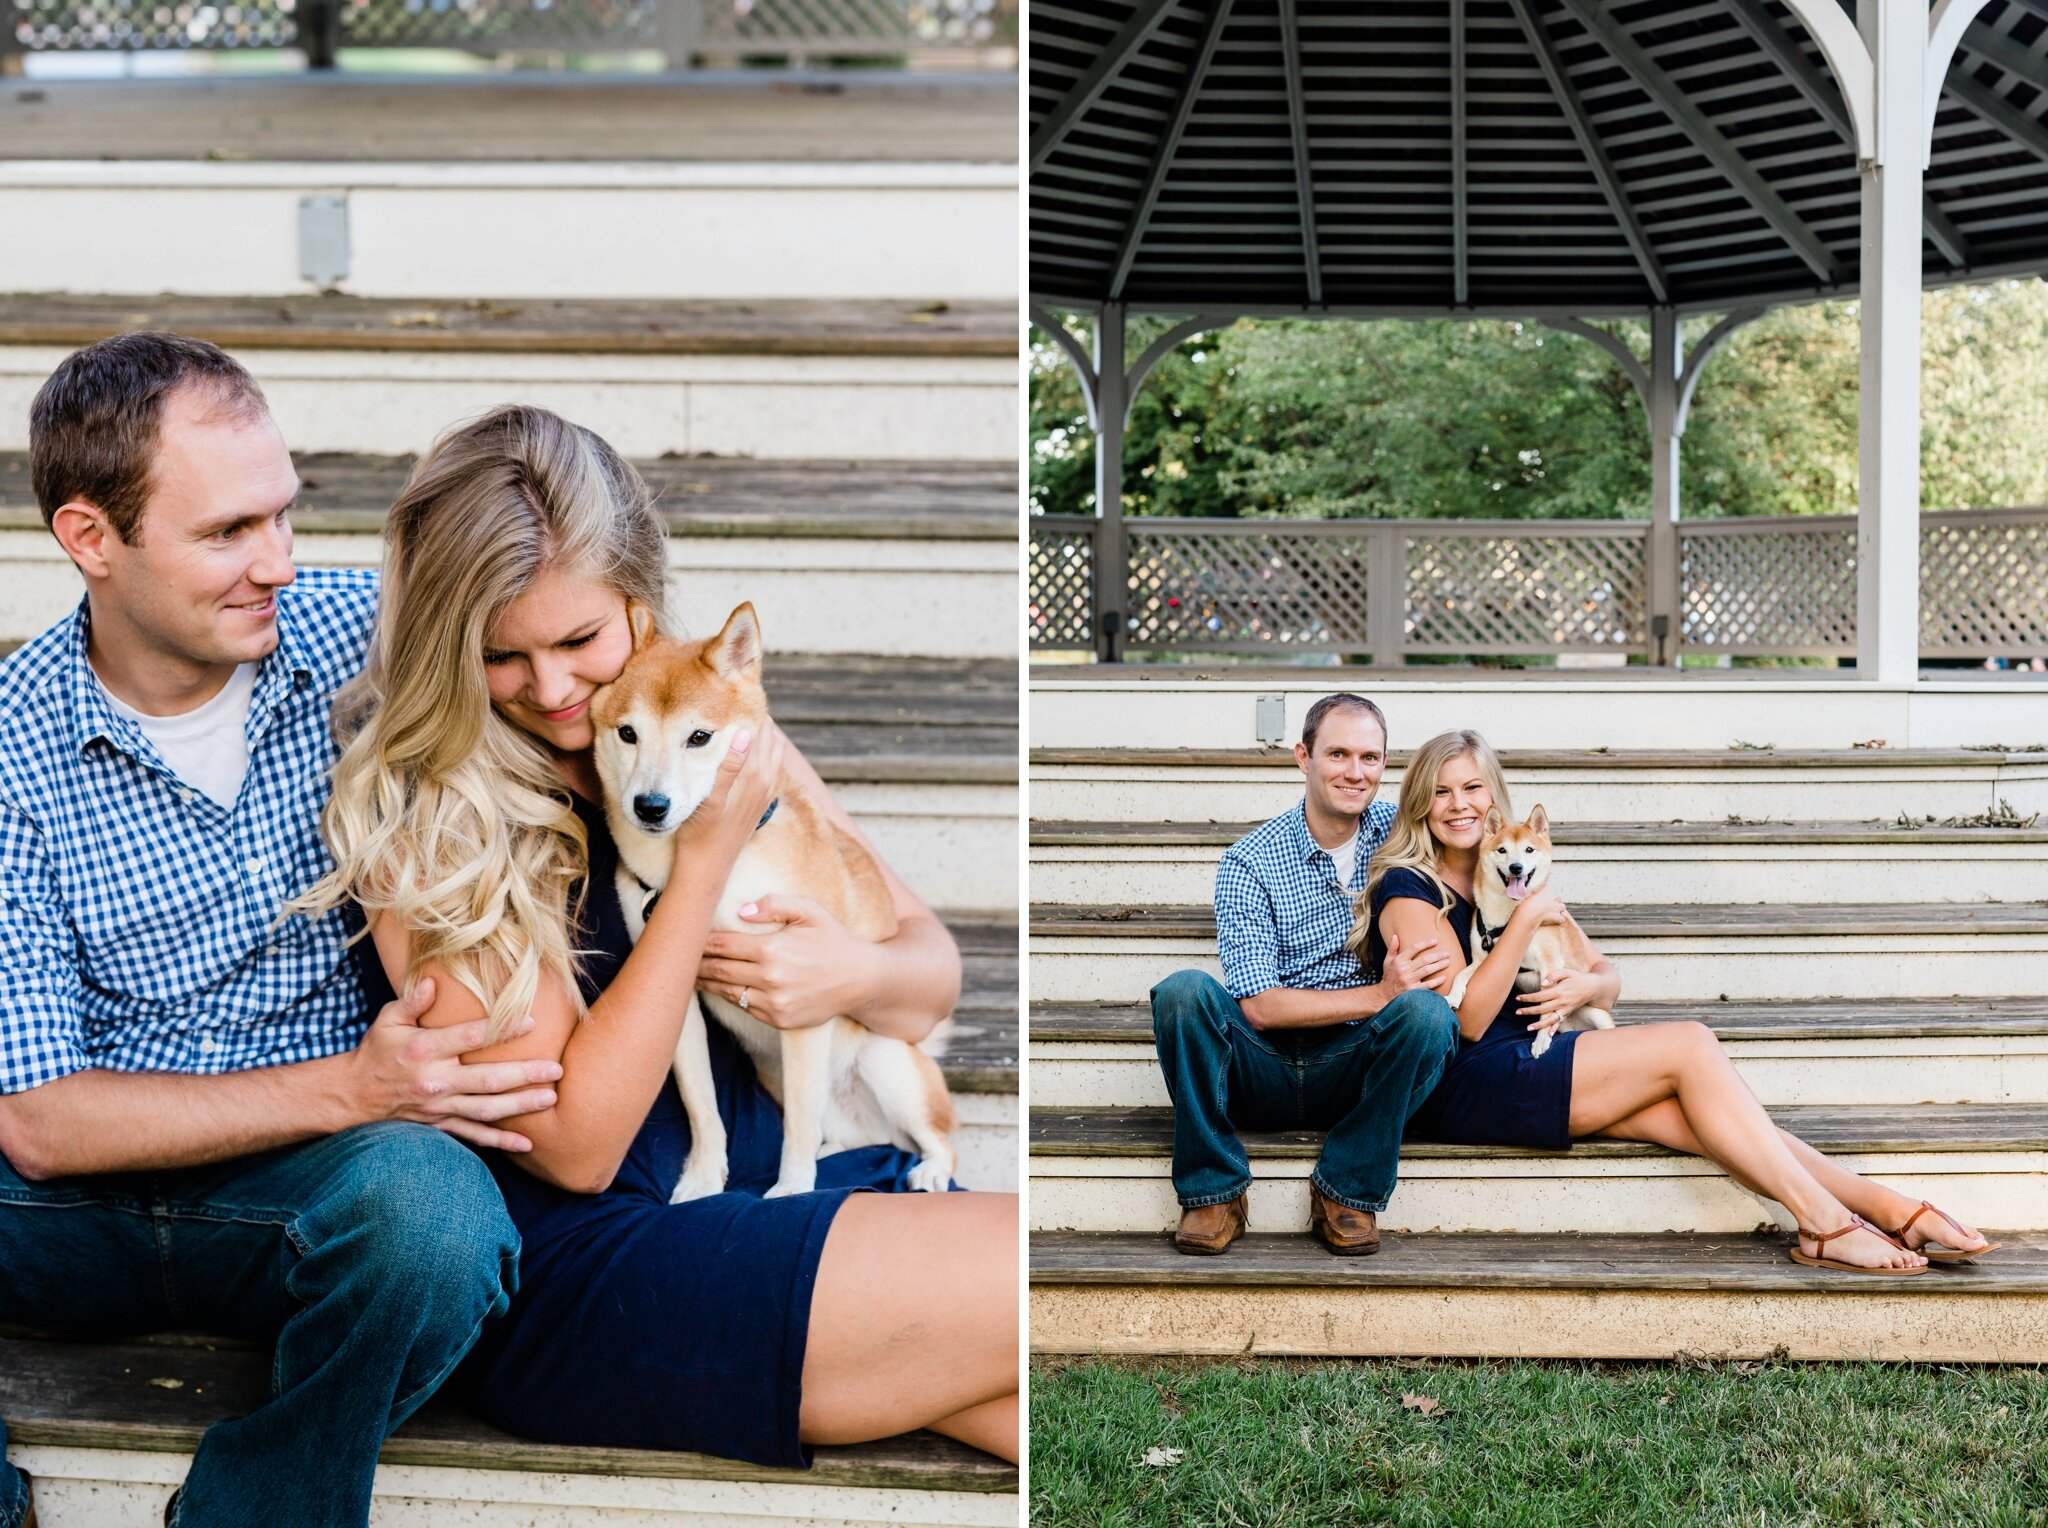 Emily Grace Photography, Lancaster PA Wedding Photographer, General Sutter Inn Wedding Venue, Lititz Wedding Venue, Lititz Springs Park Engagement Photos, Engagement Photos with Dog